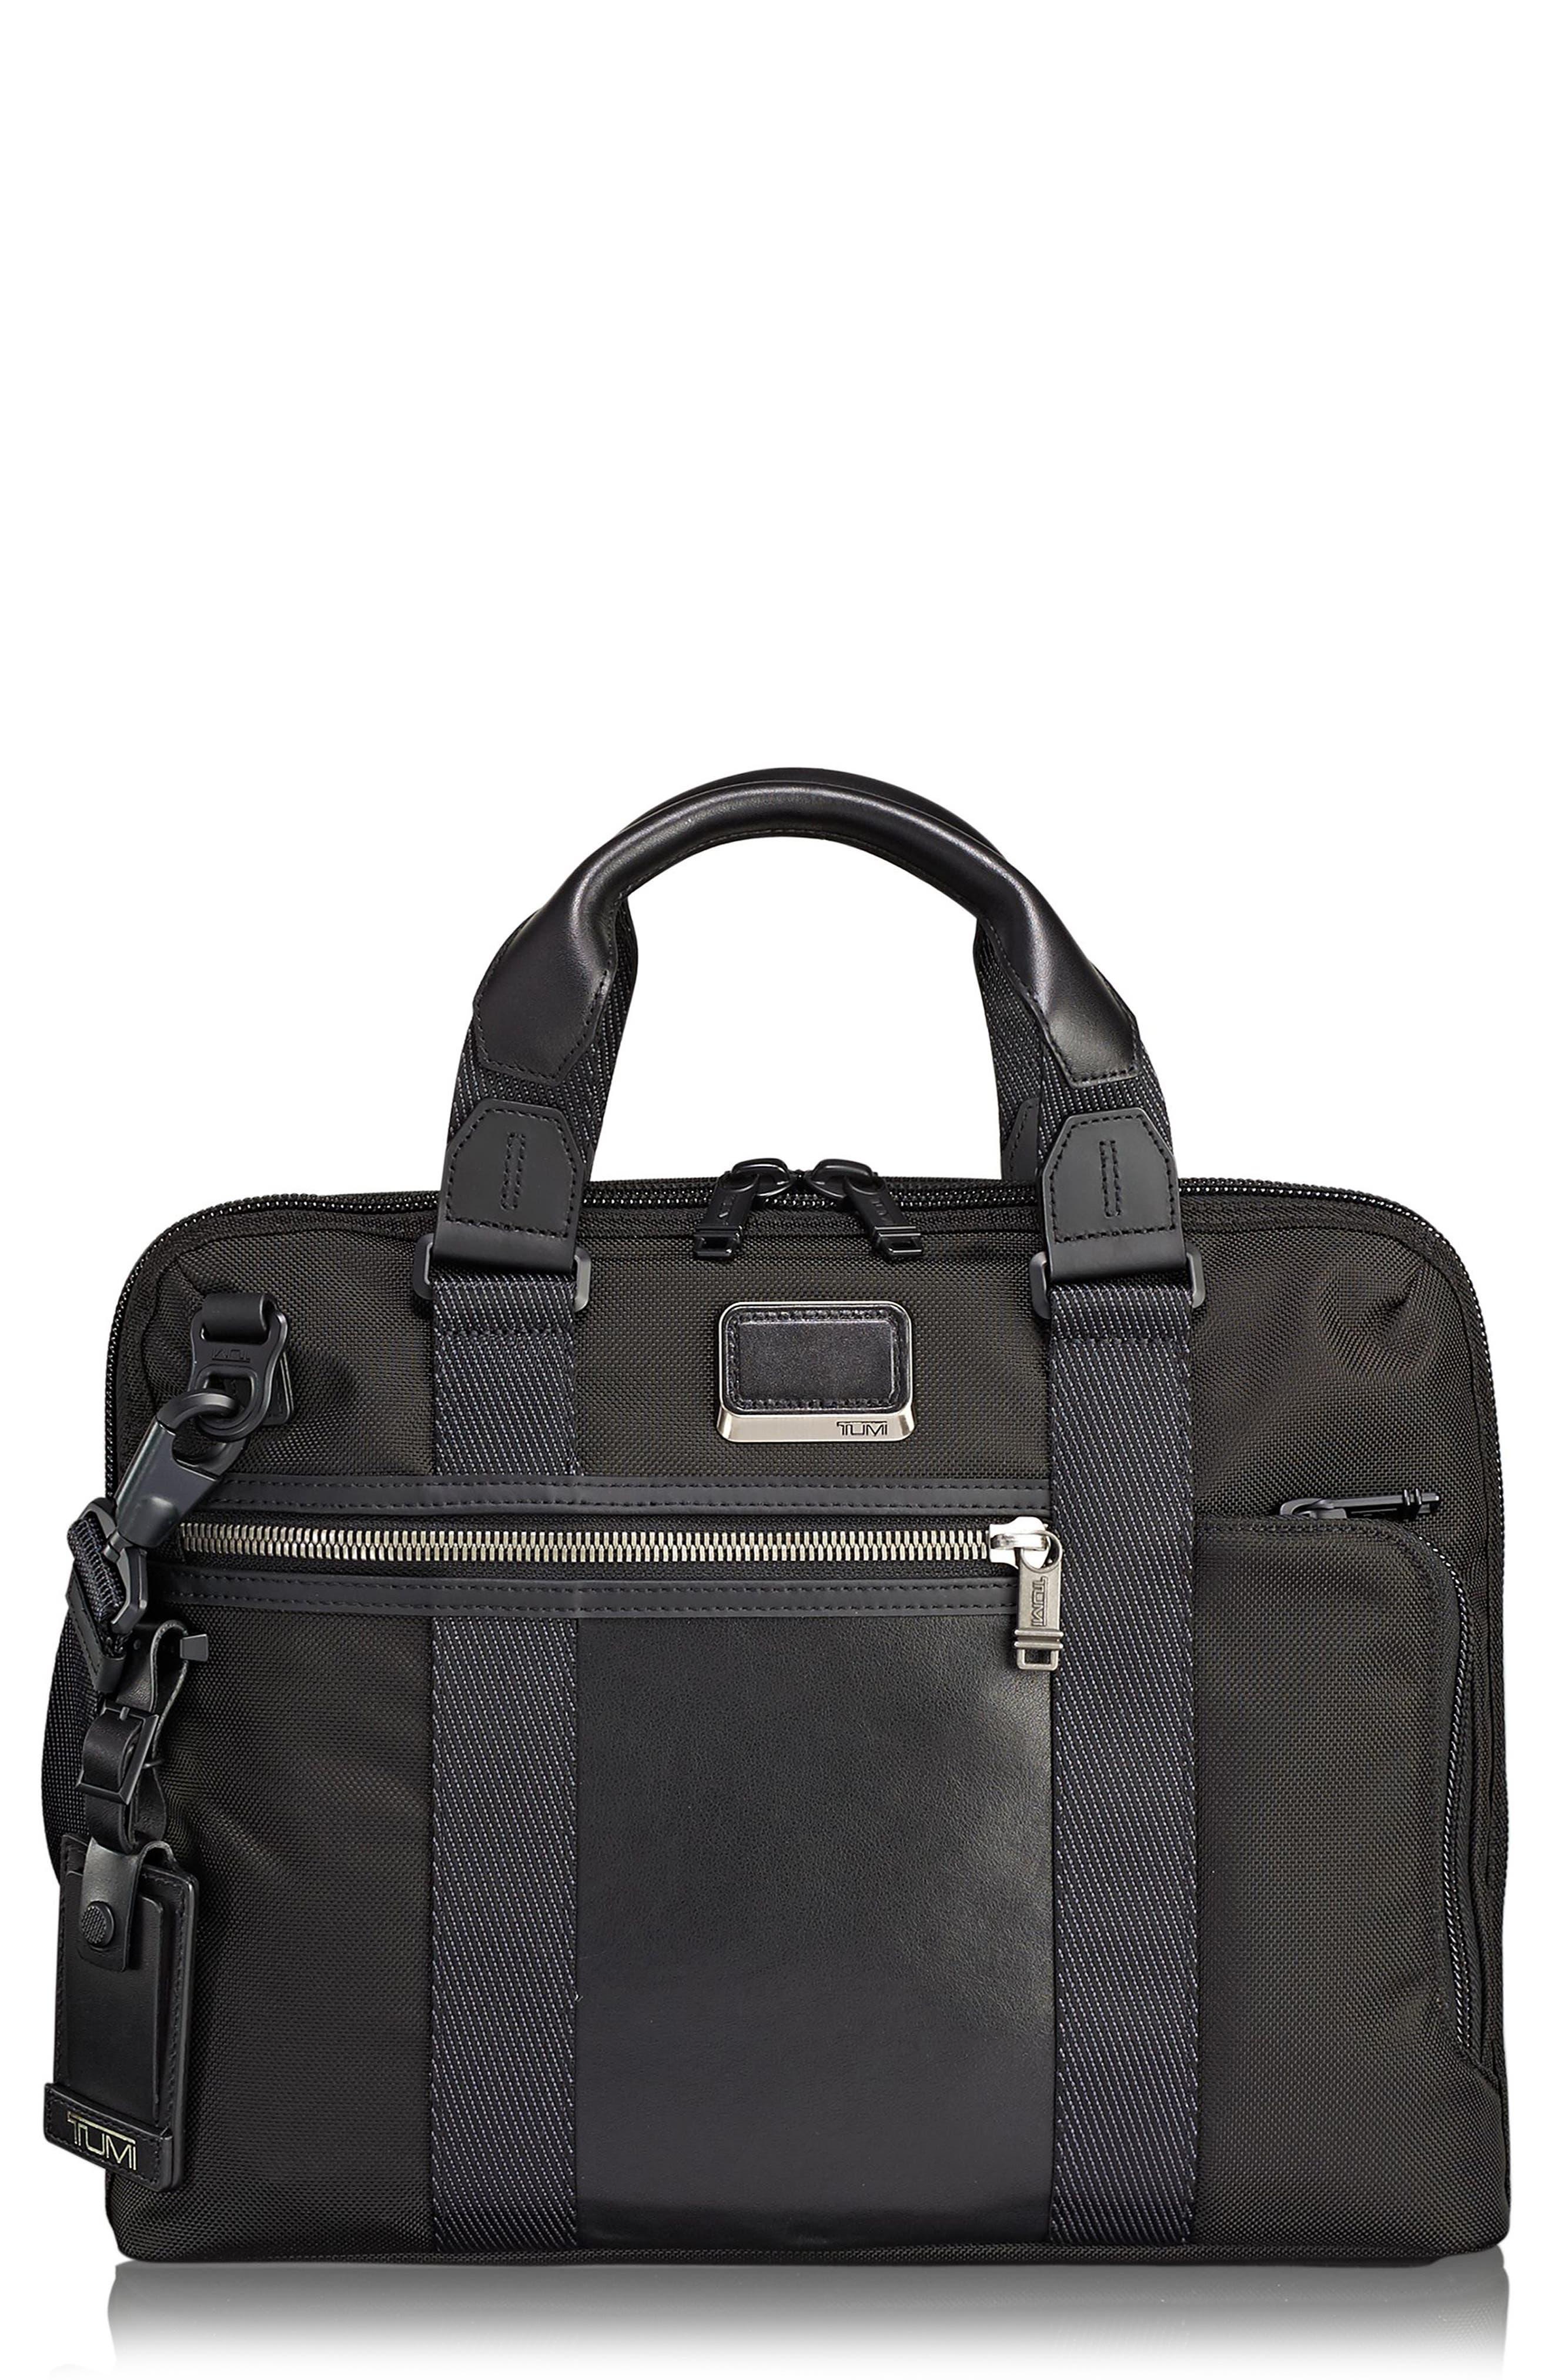 TUMI, Alpha Bravo - Charleston Briefcase, Main thumbnail 1, color, BLACK